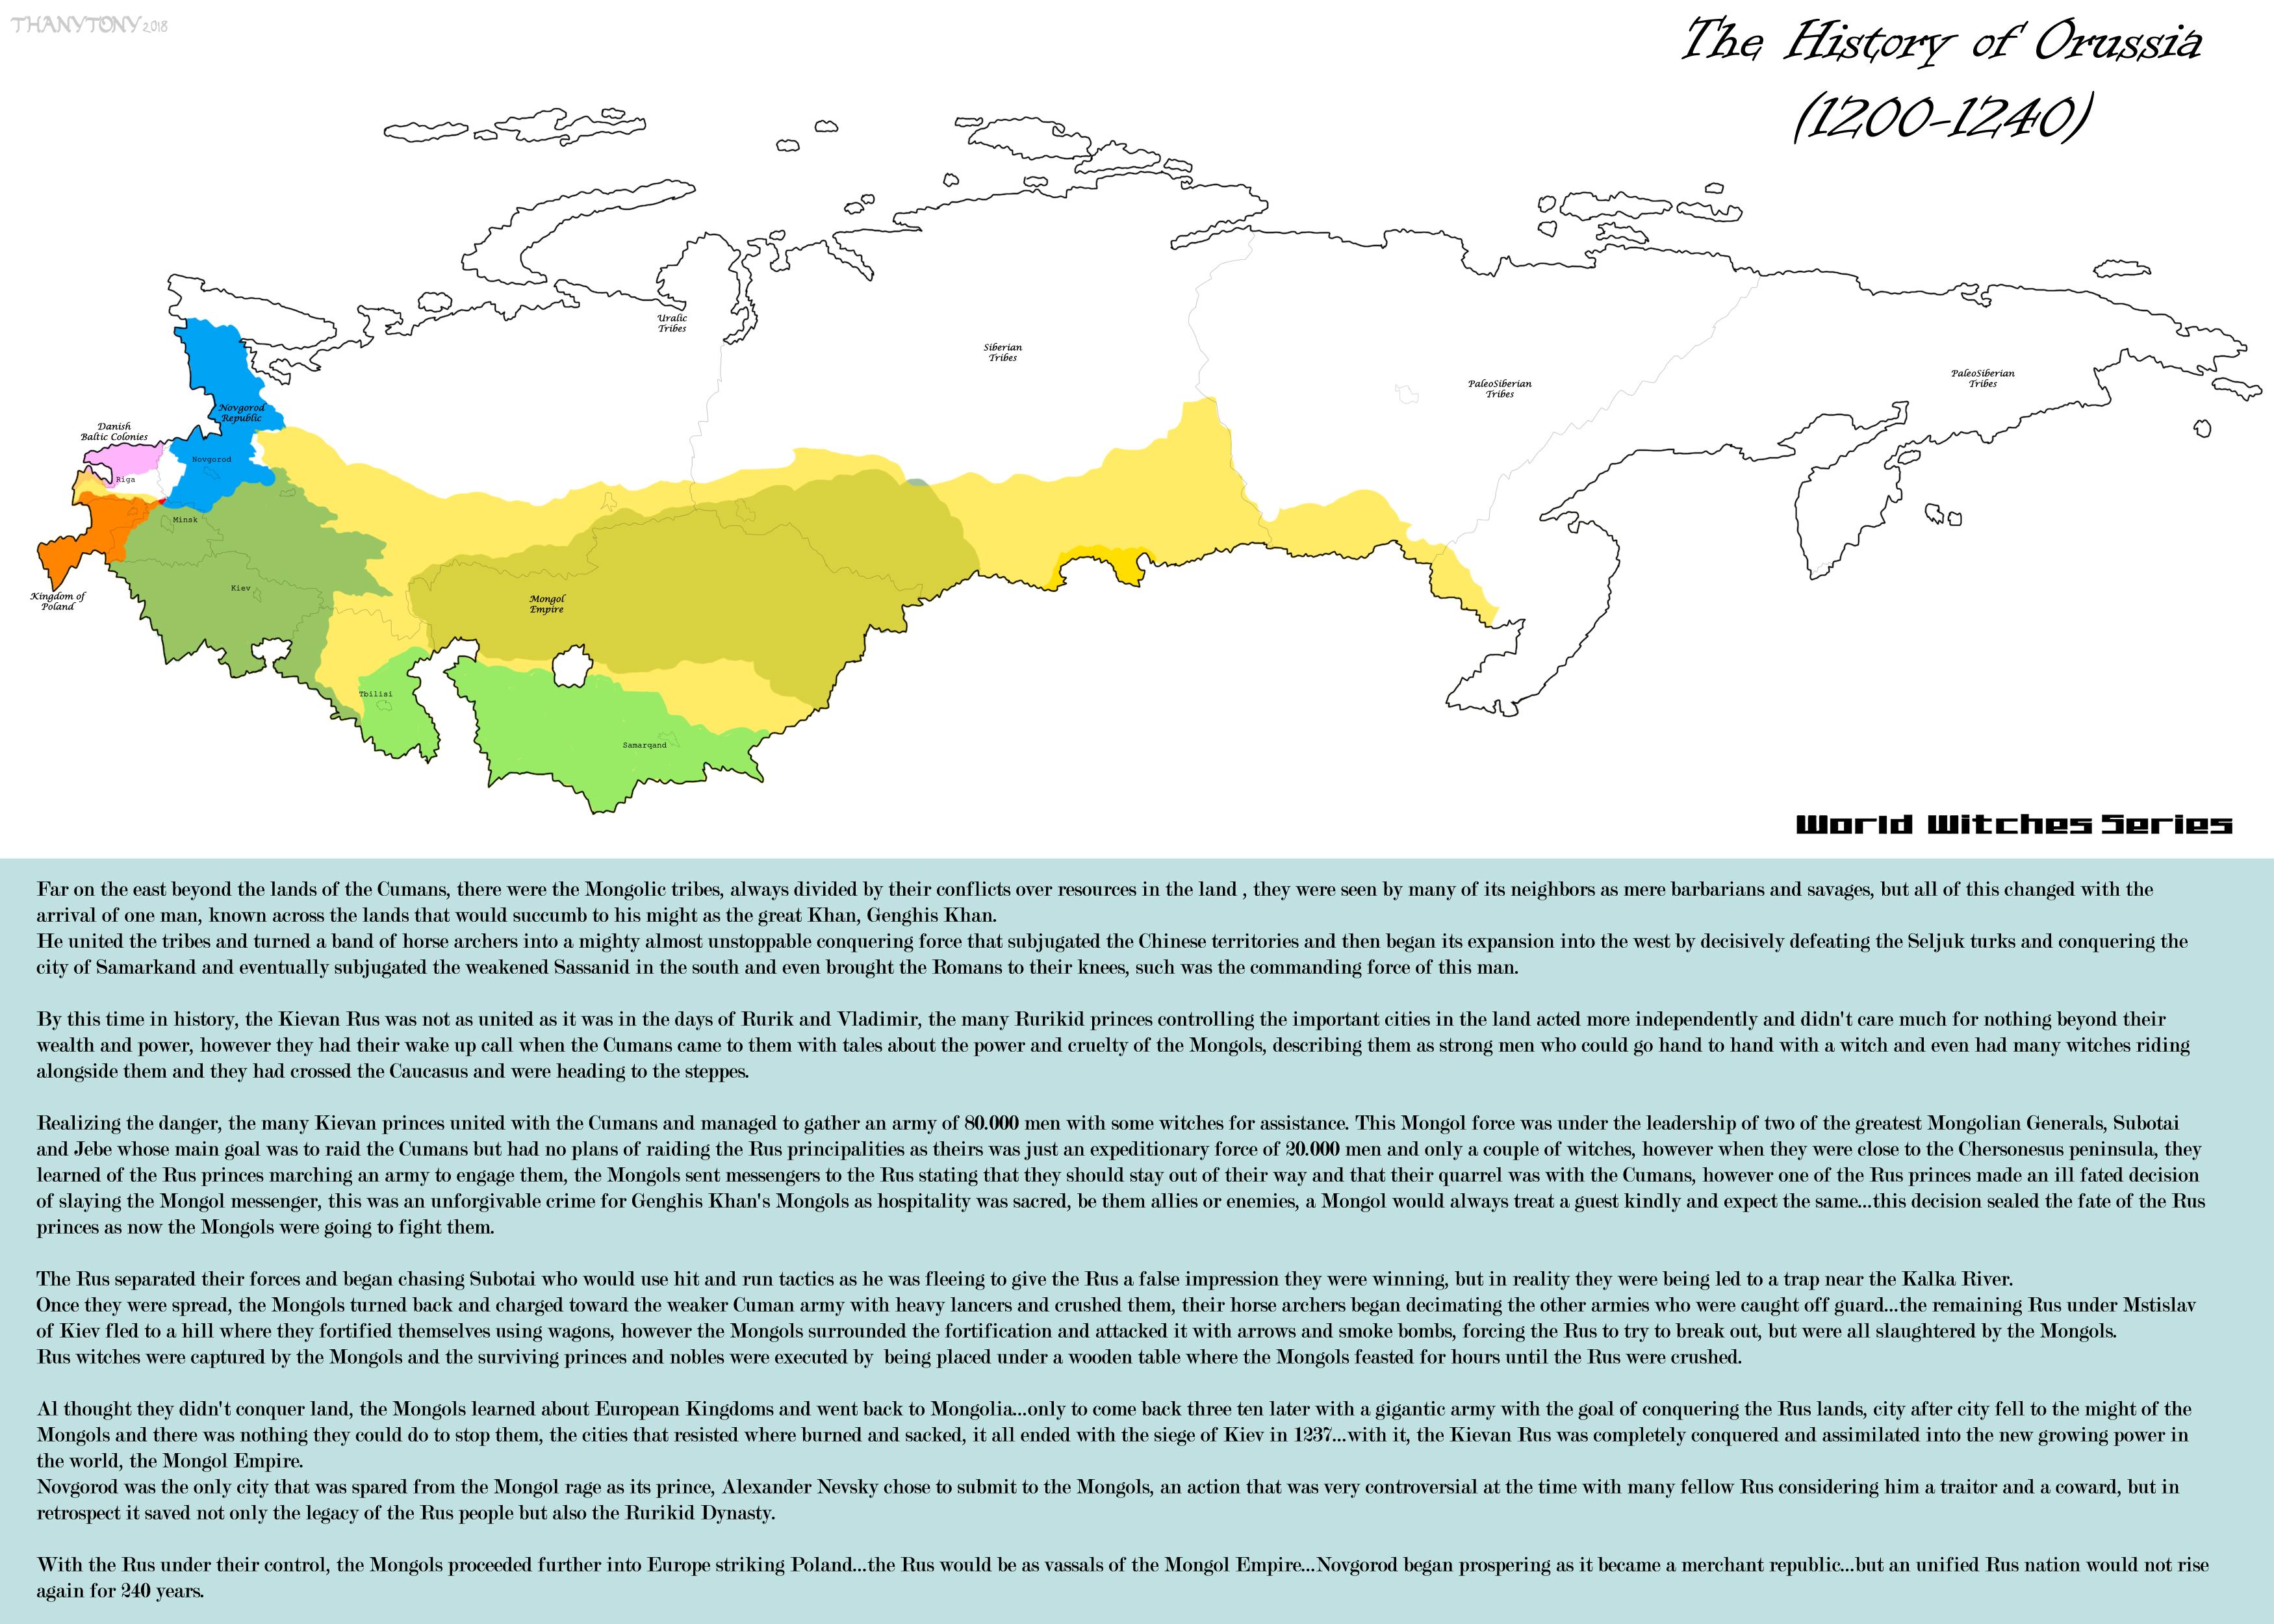 WW: History of Orussia (Pt 6) by ThanyTony